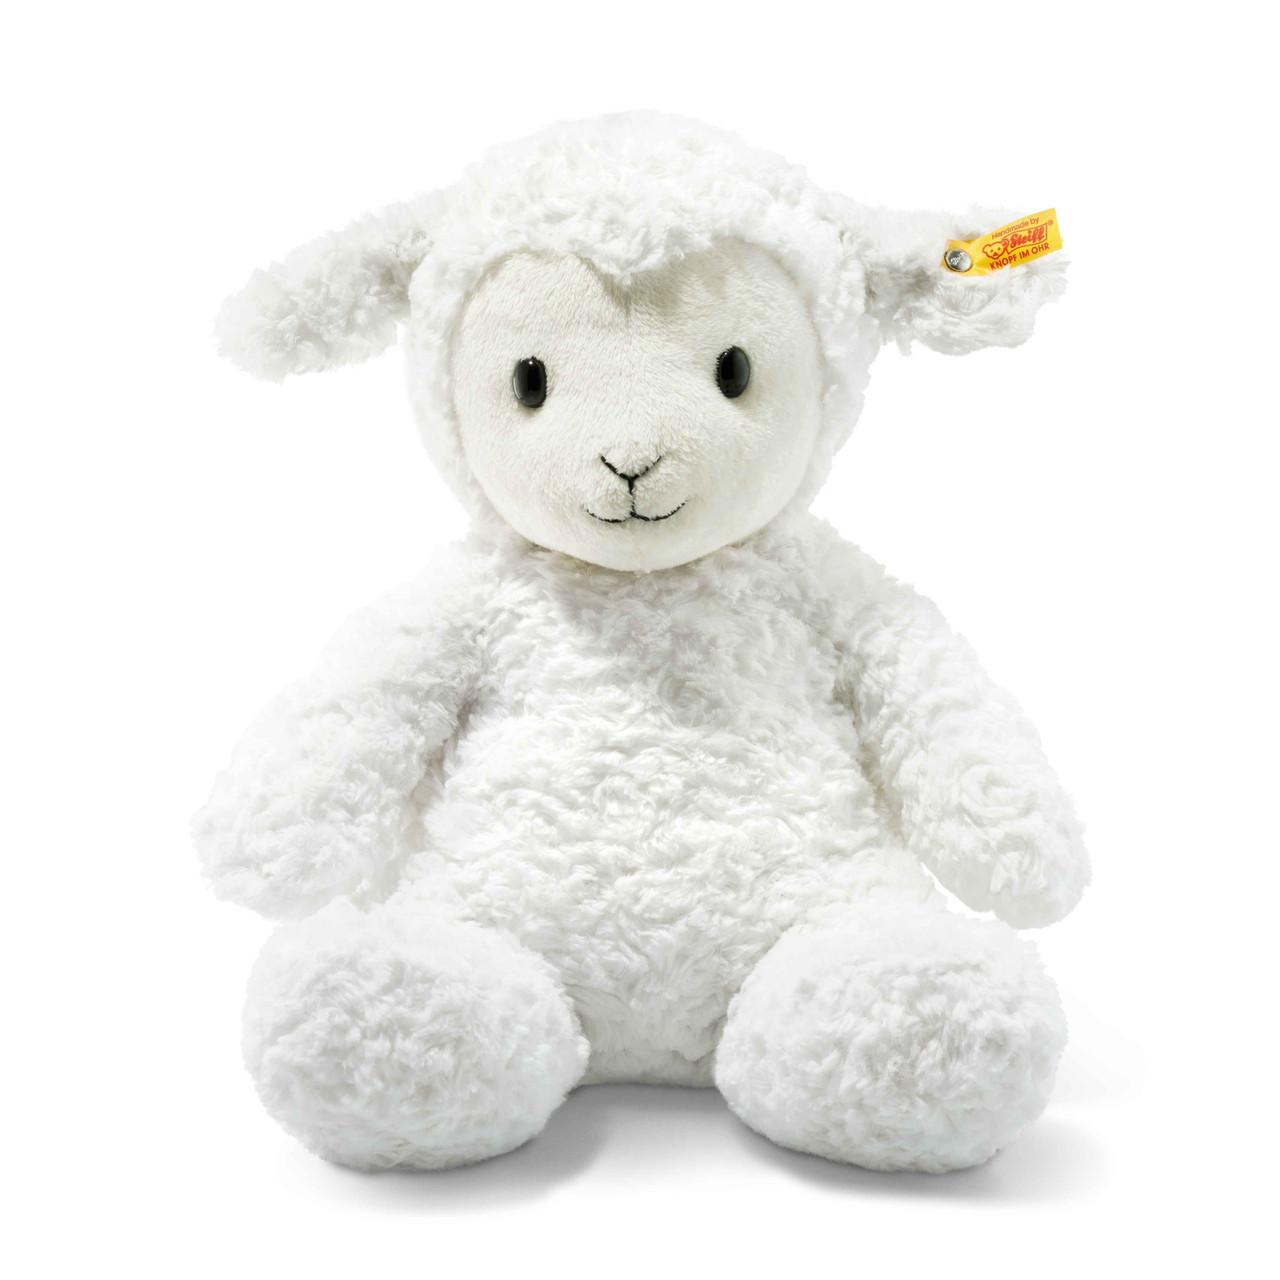 Soft Cuddly Friends Steiff Fuzzy Lamb 38cm